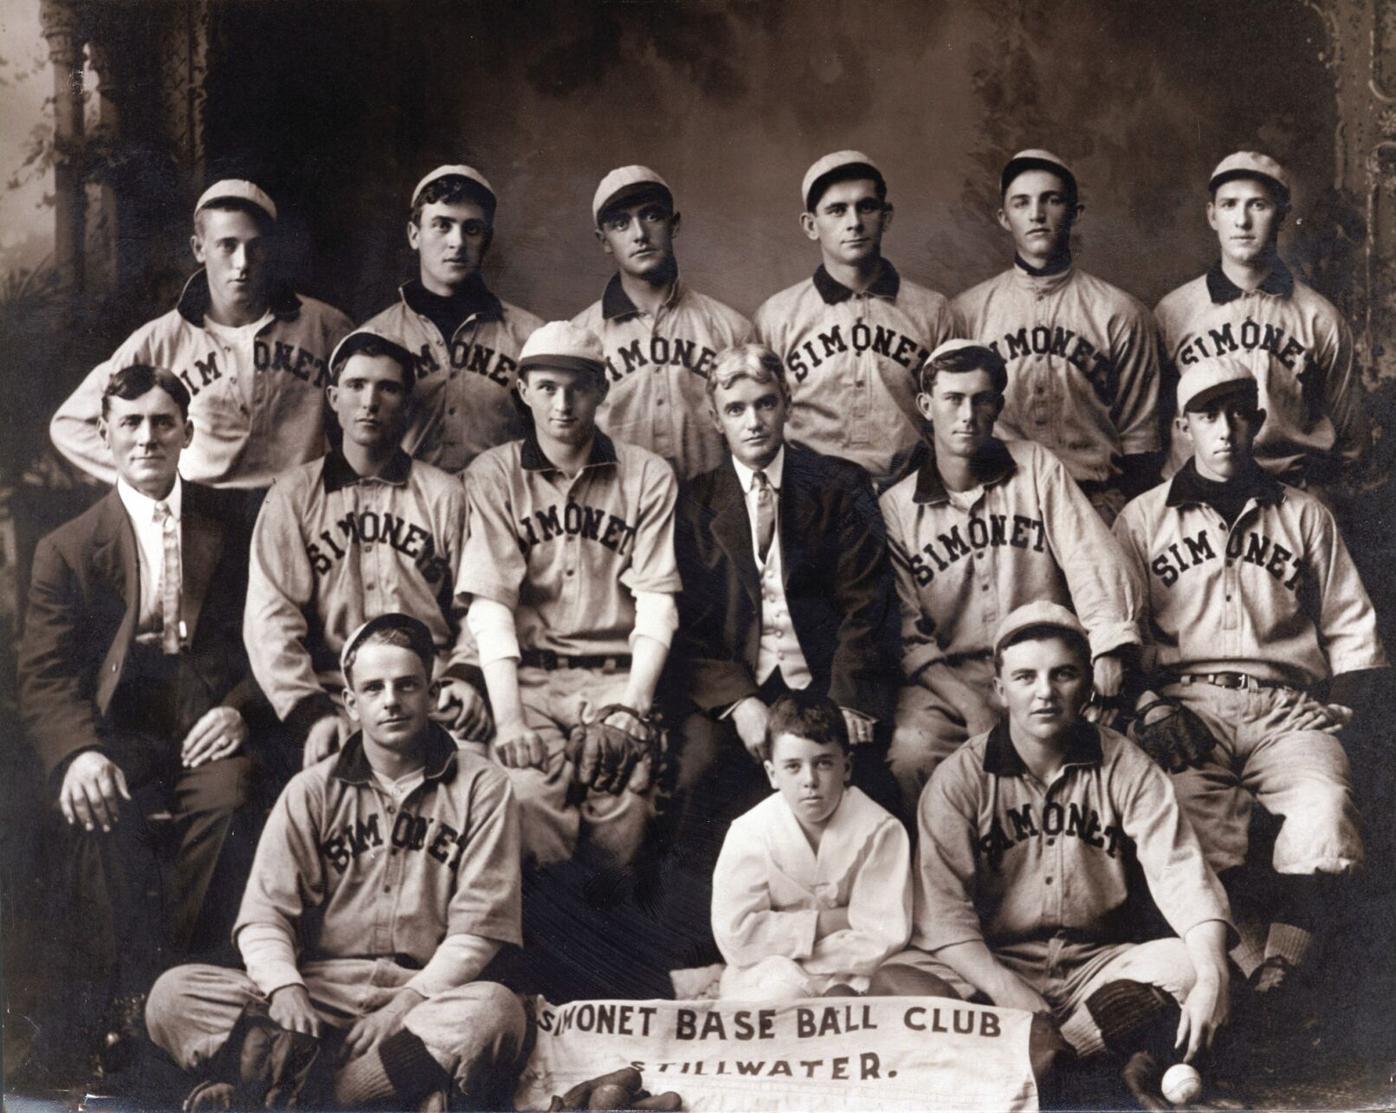 Simonet Base Ball Club - 1.jpg